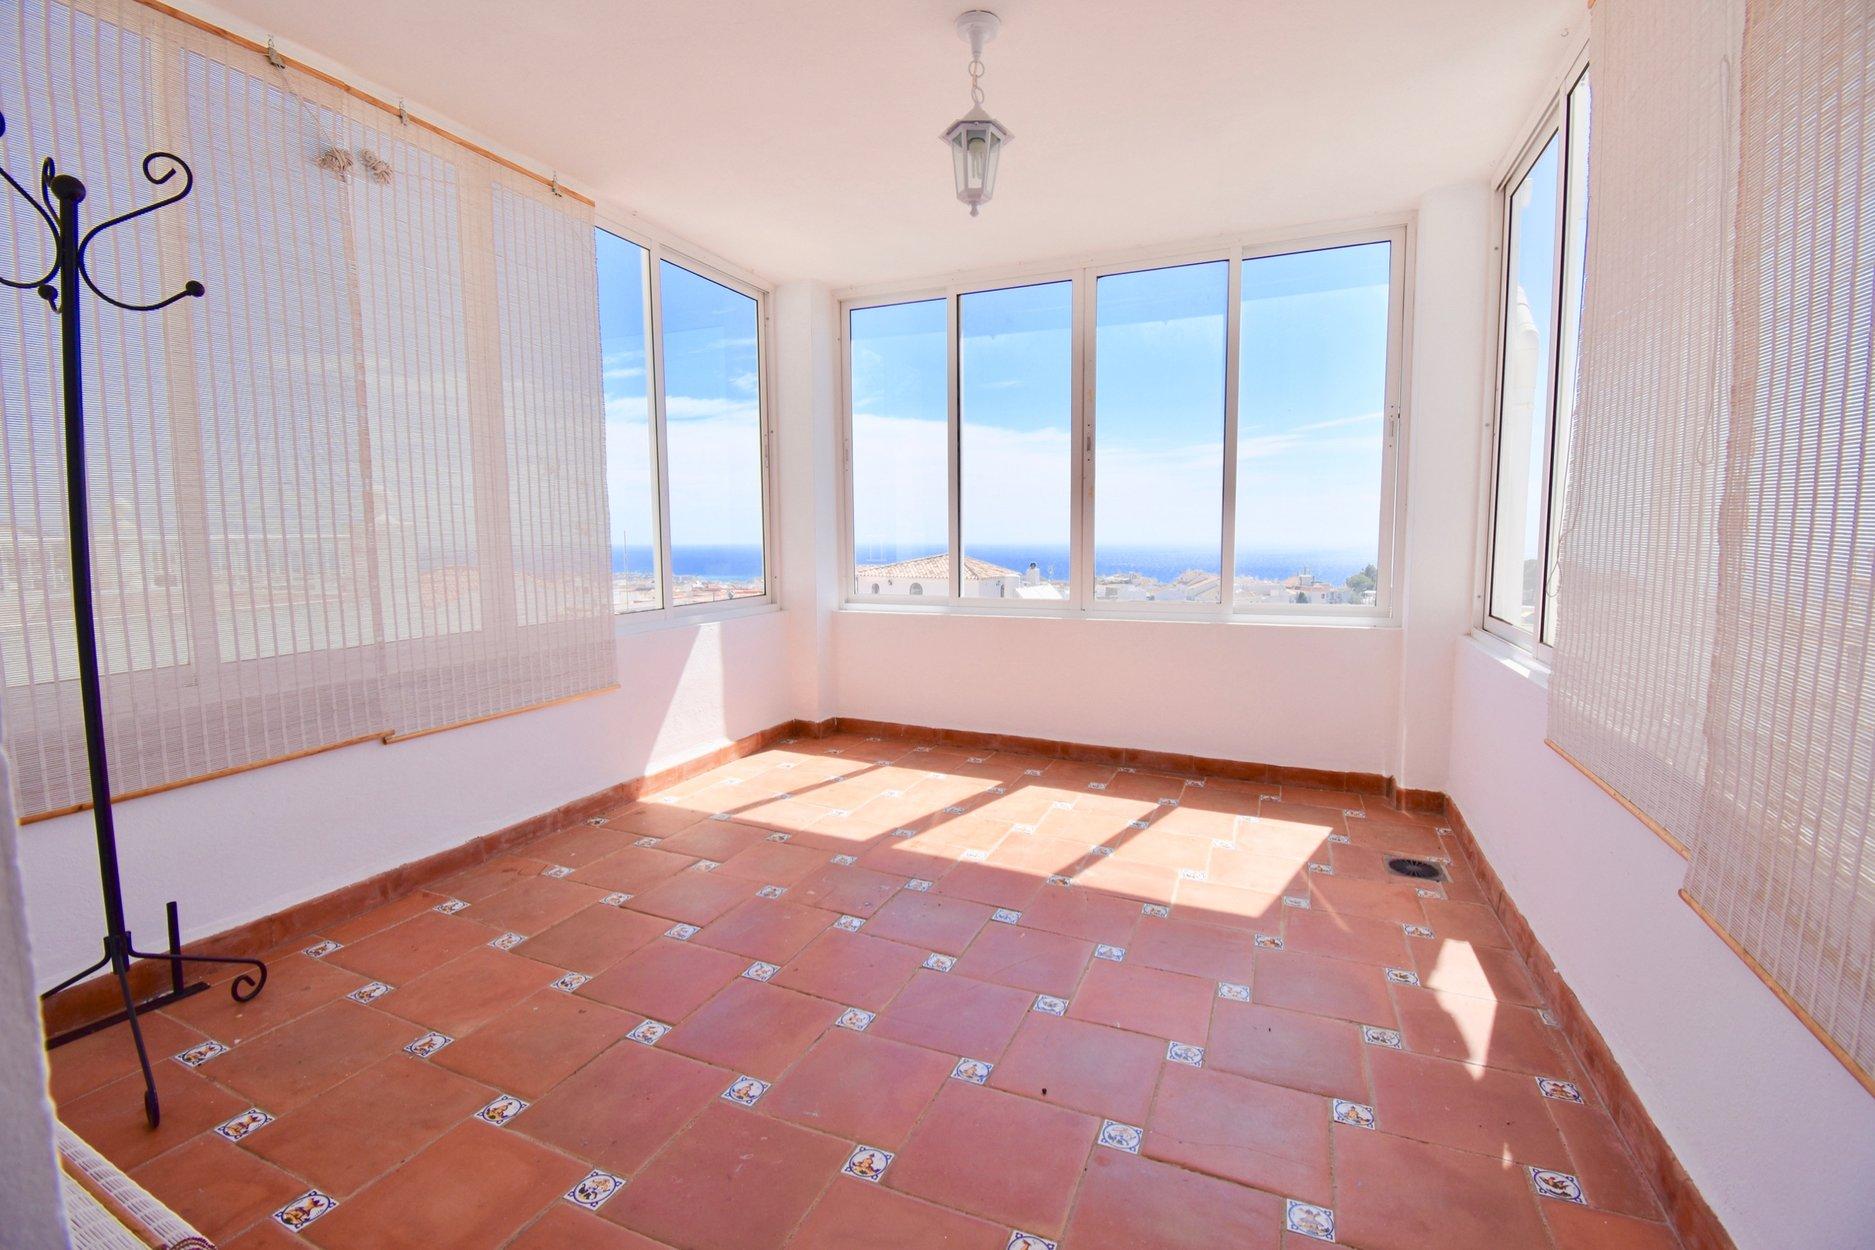 Penthouse for sale in Benalmadena Pueblo